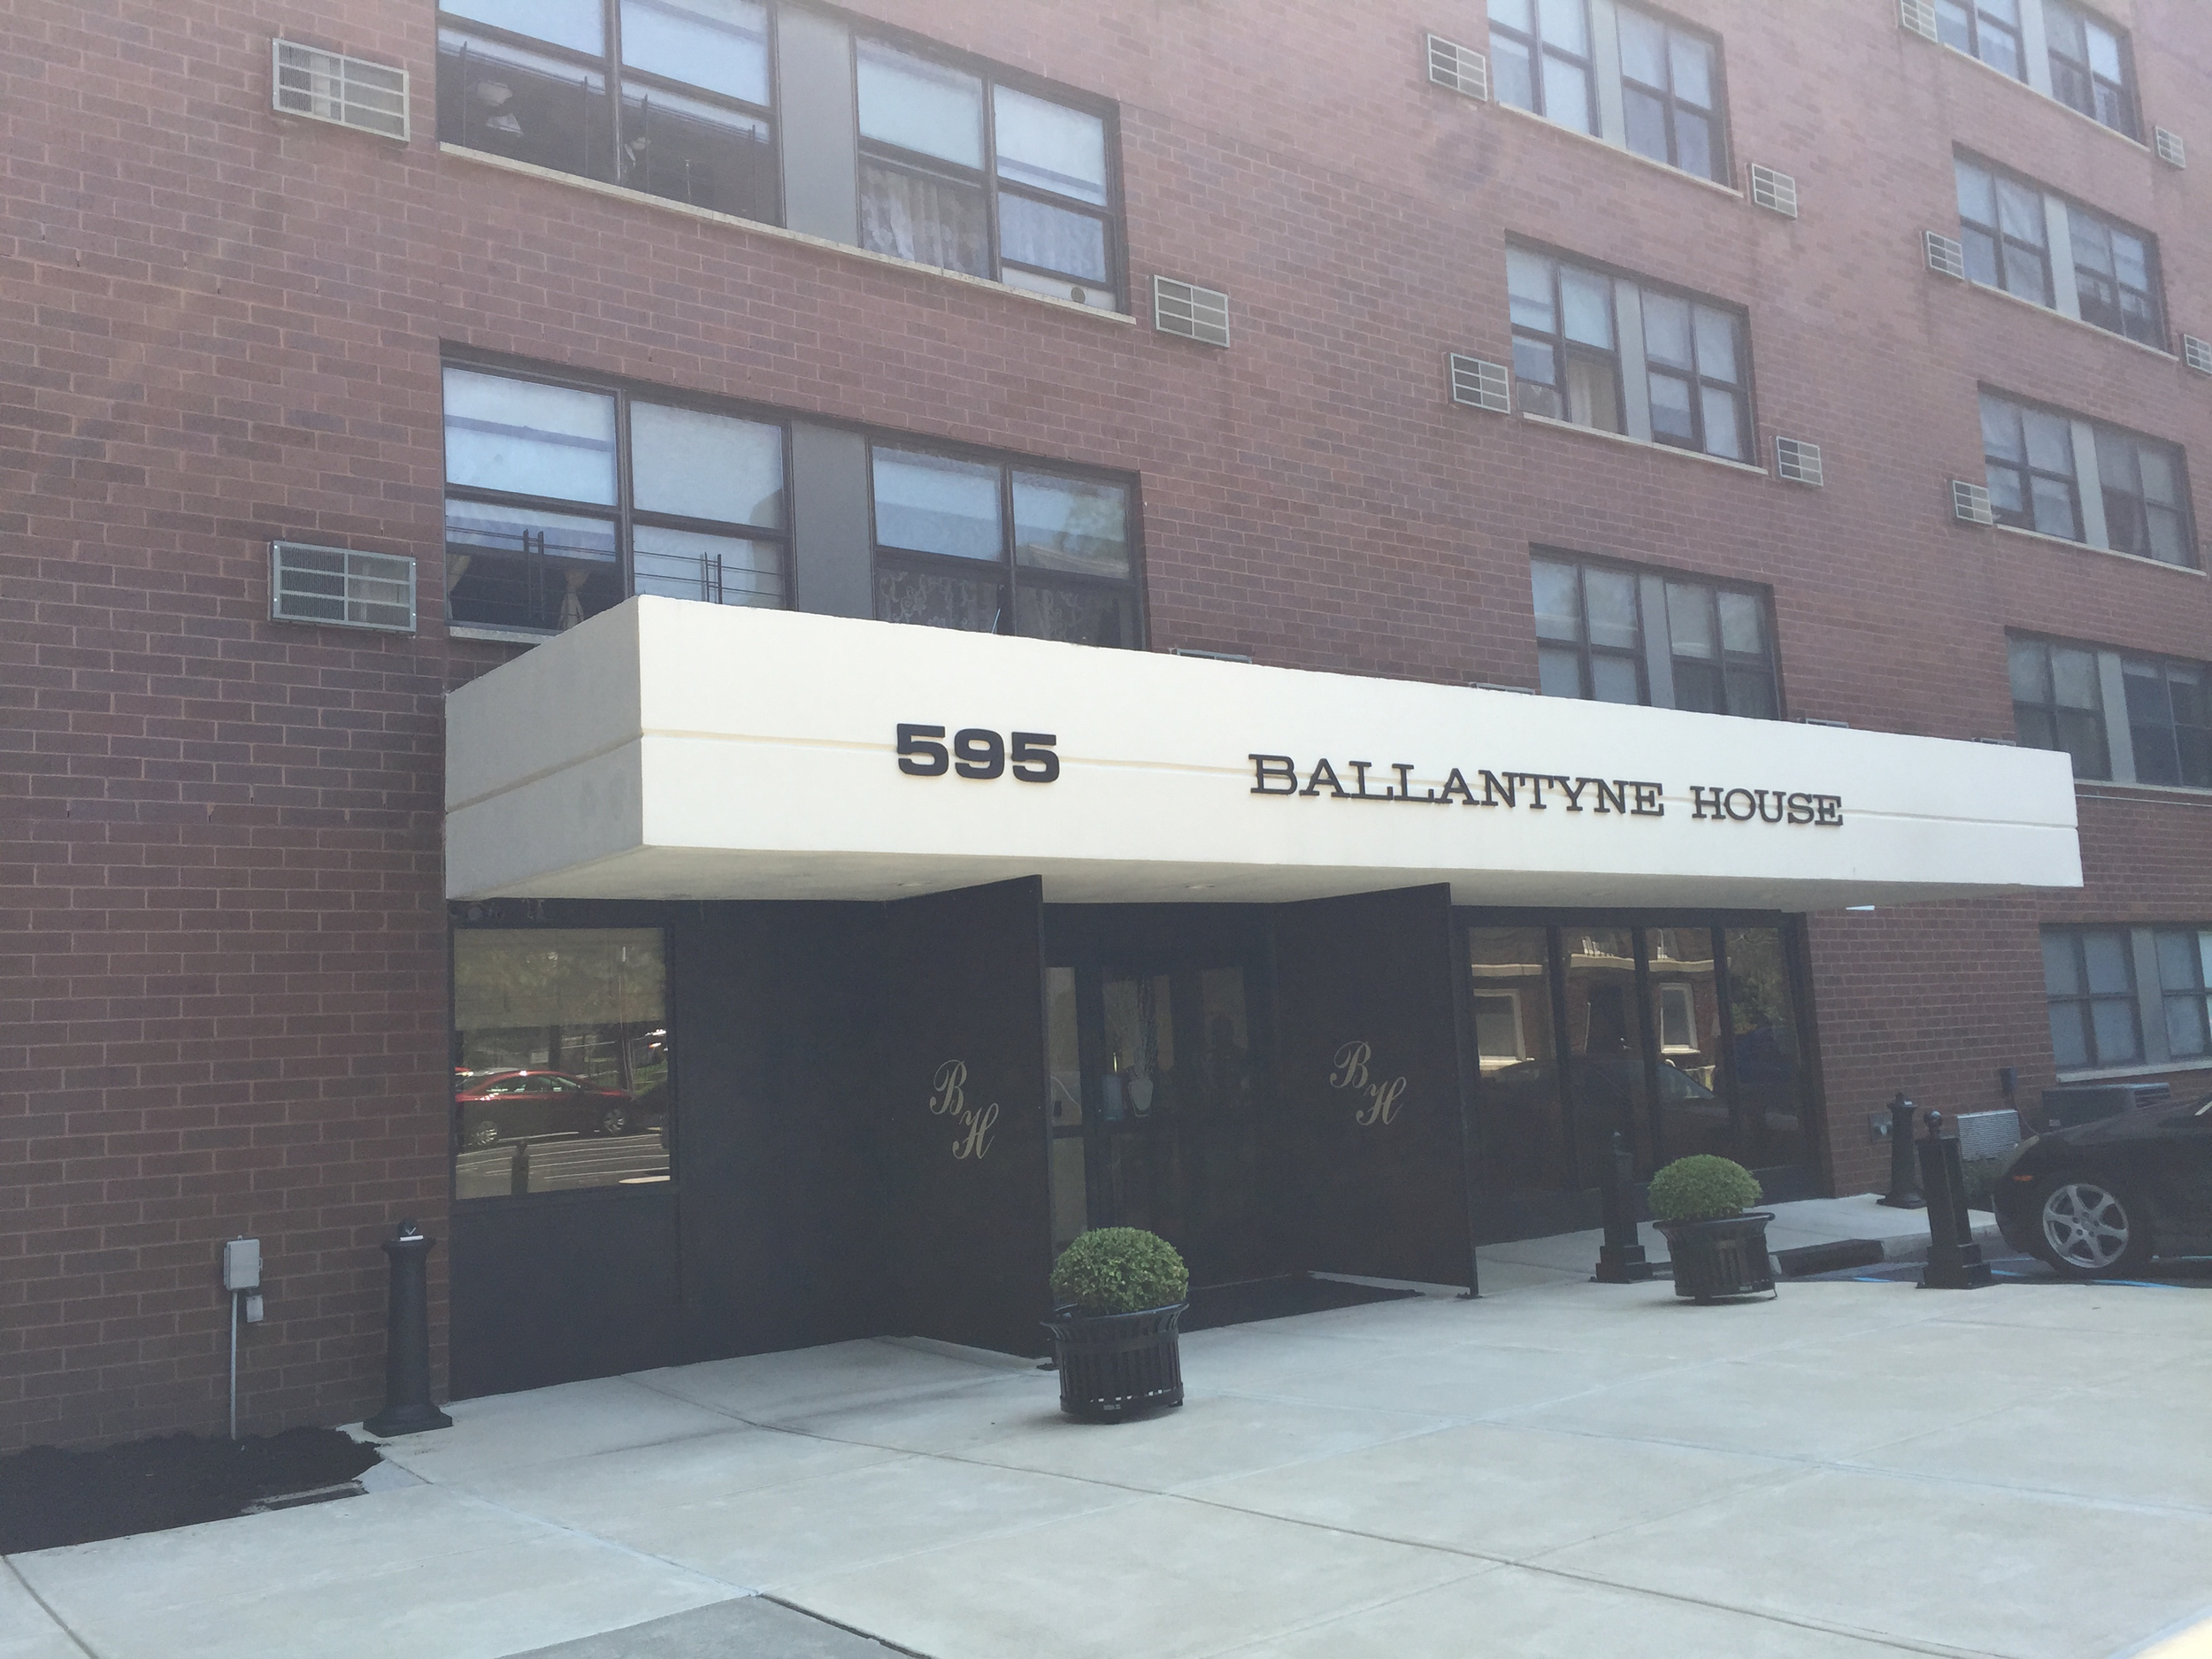 Ballantine House